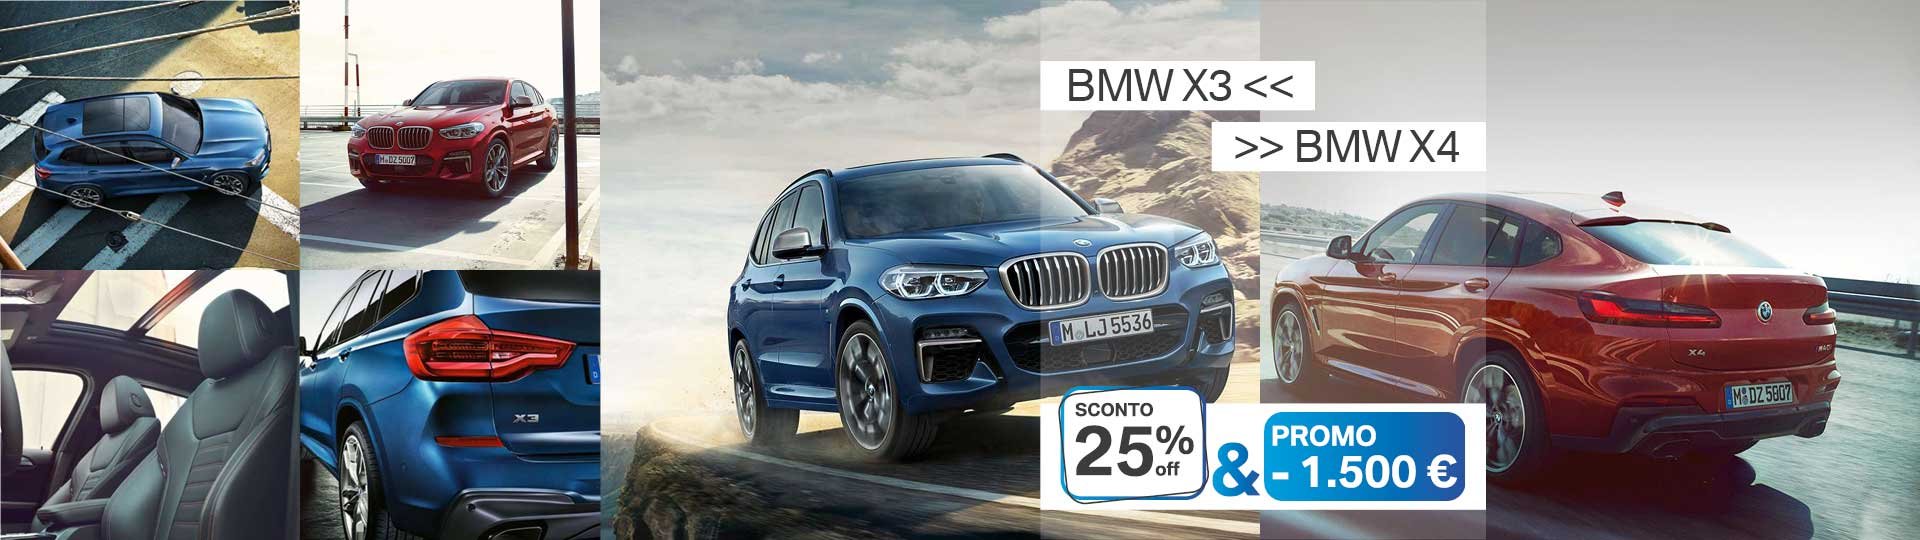 BMW-X3-X4-min.jpg